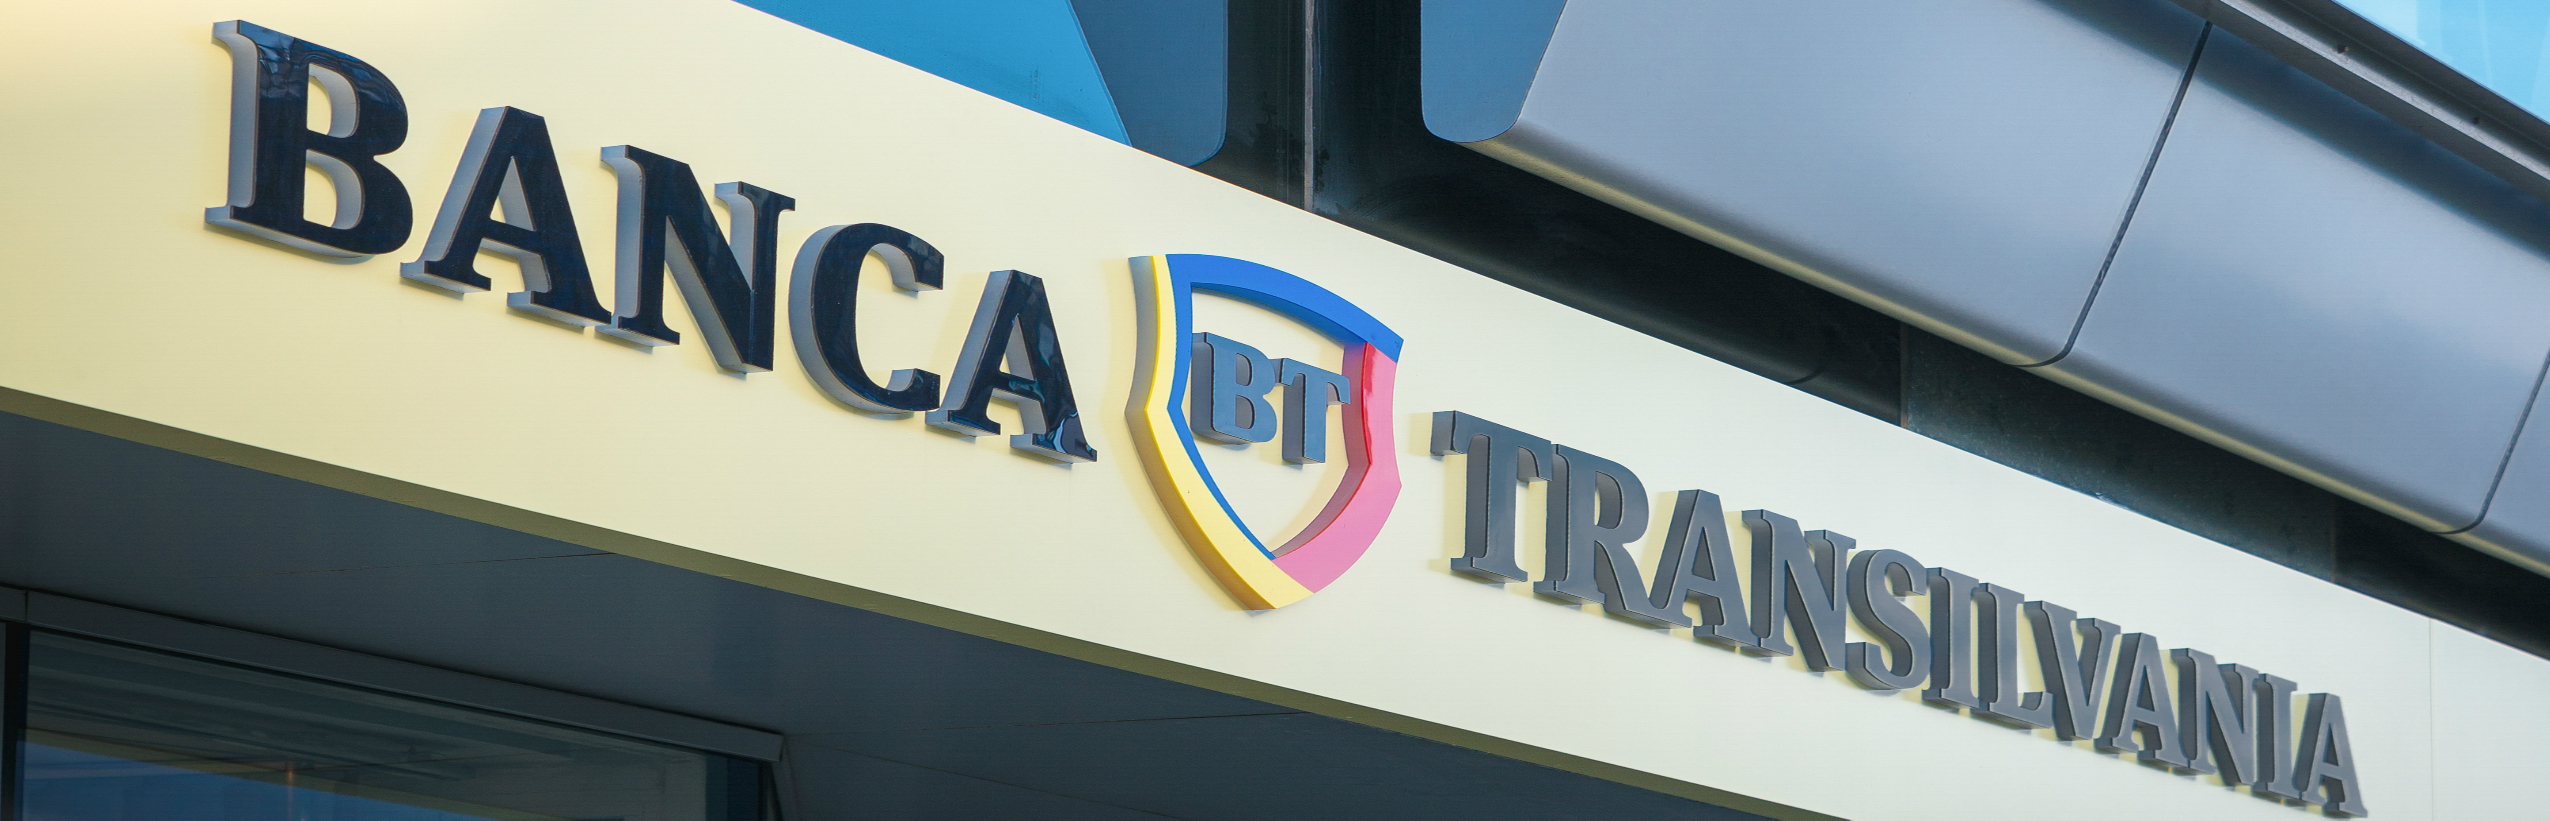 Banca Transilvania, cel mai valoros brand bancar romanesc, si in acest an